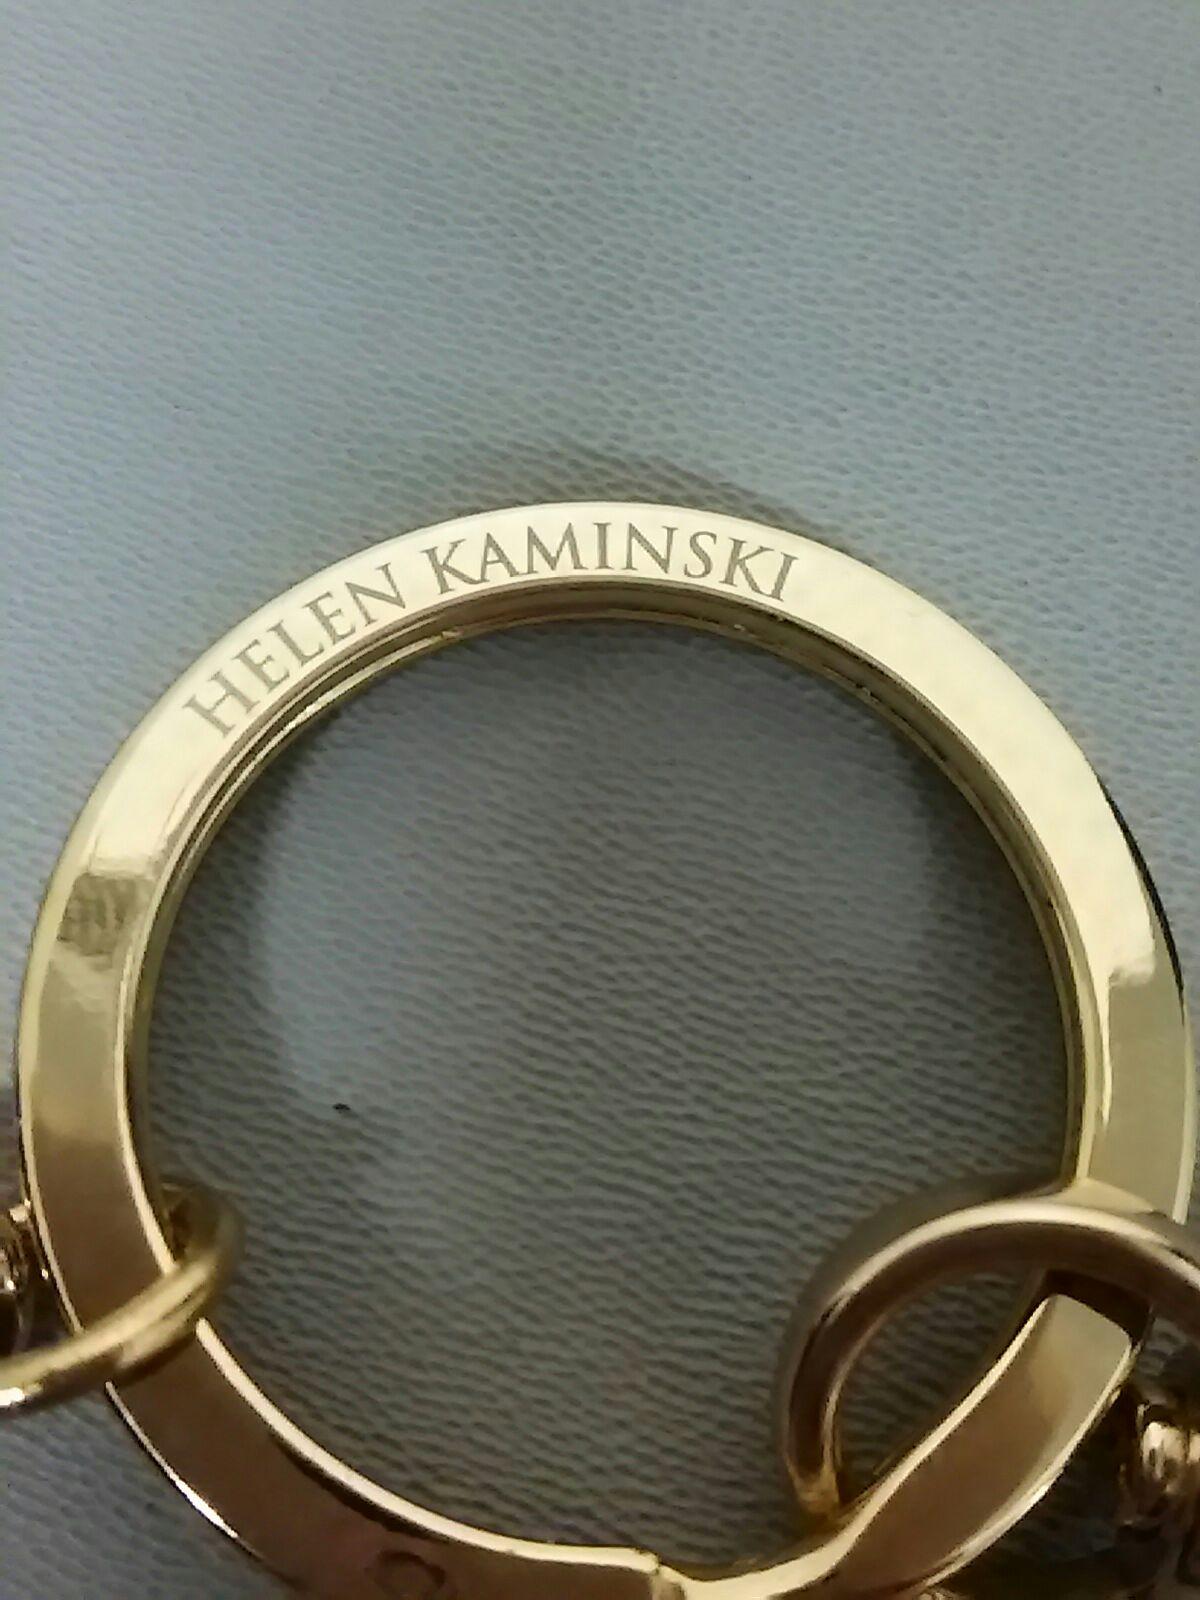 HELEN KAMINSKI(ヘレンカミンスキー)のキーホルダー(チャーム)